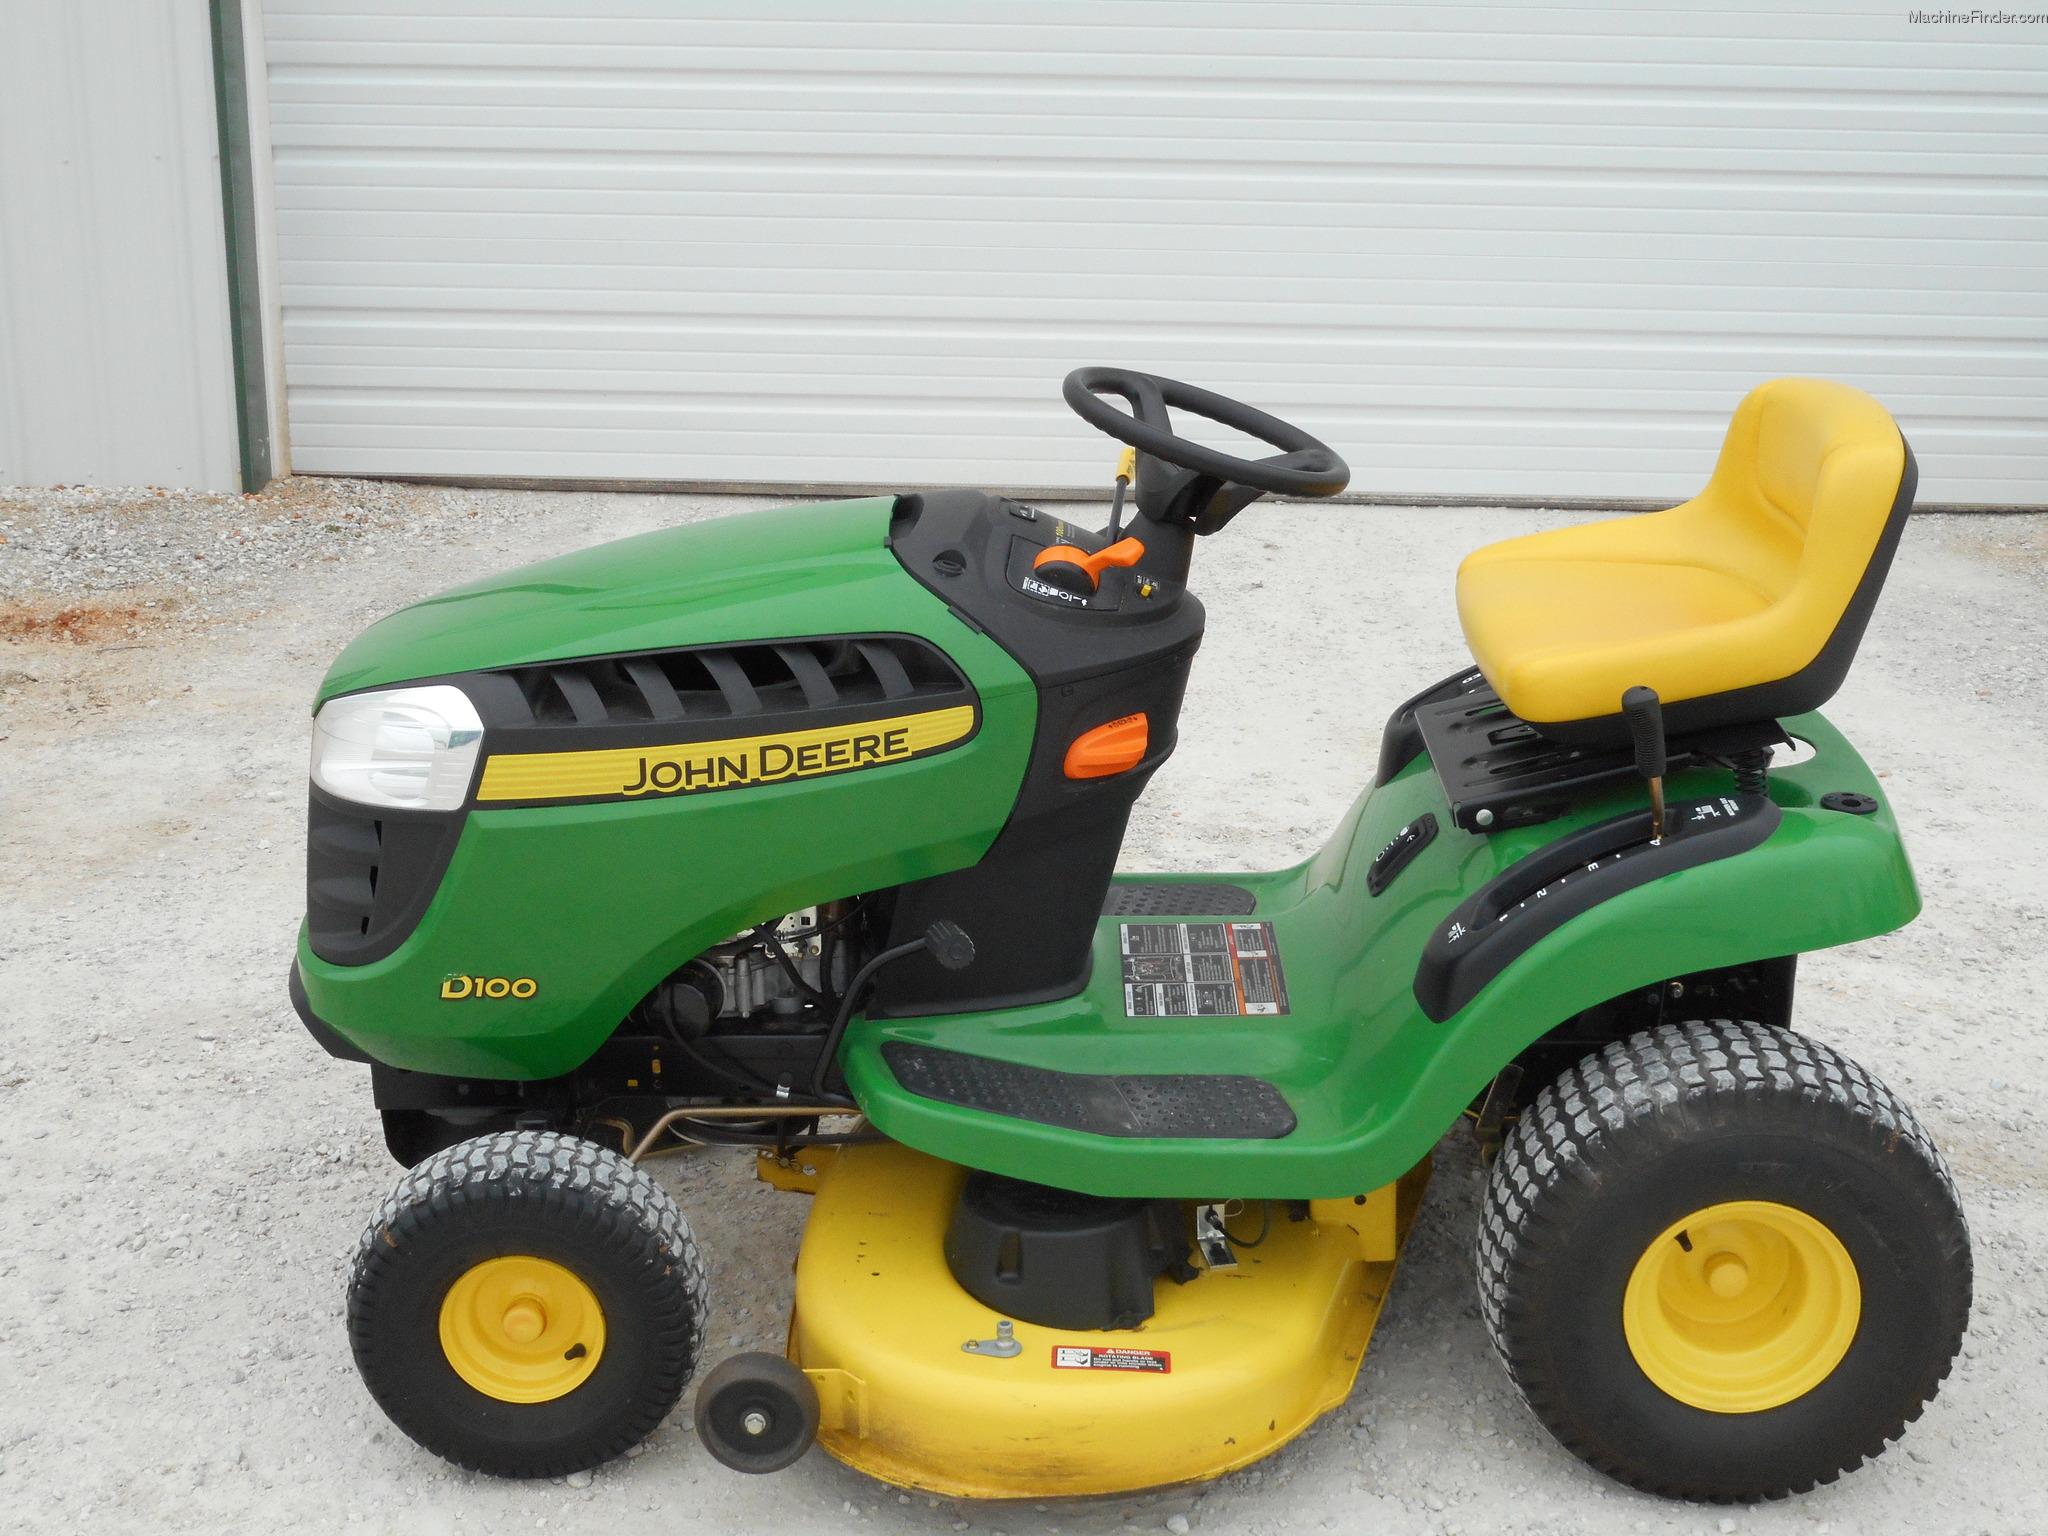 2011 John Deere D100 Lawn Amp Garden And Commercial Mowing